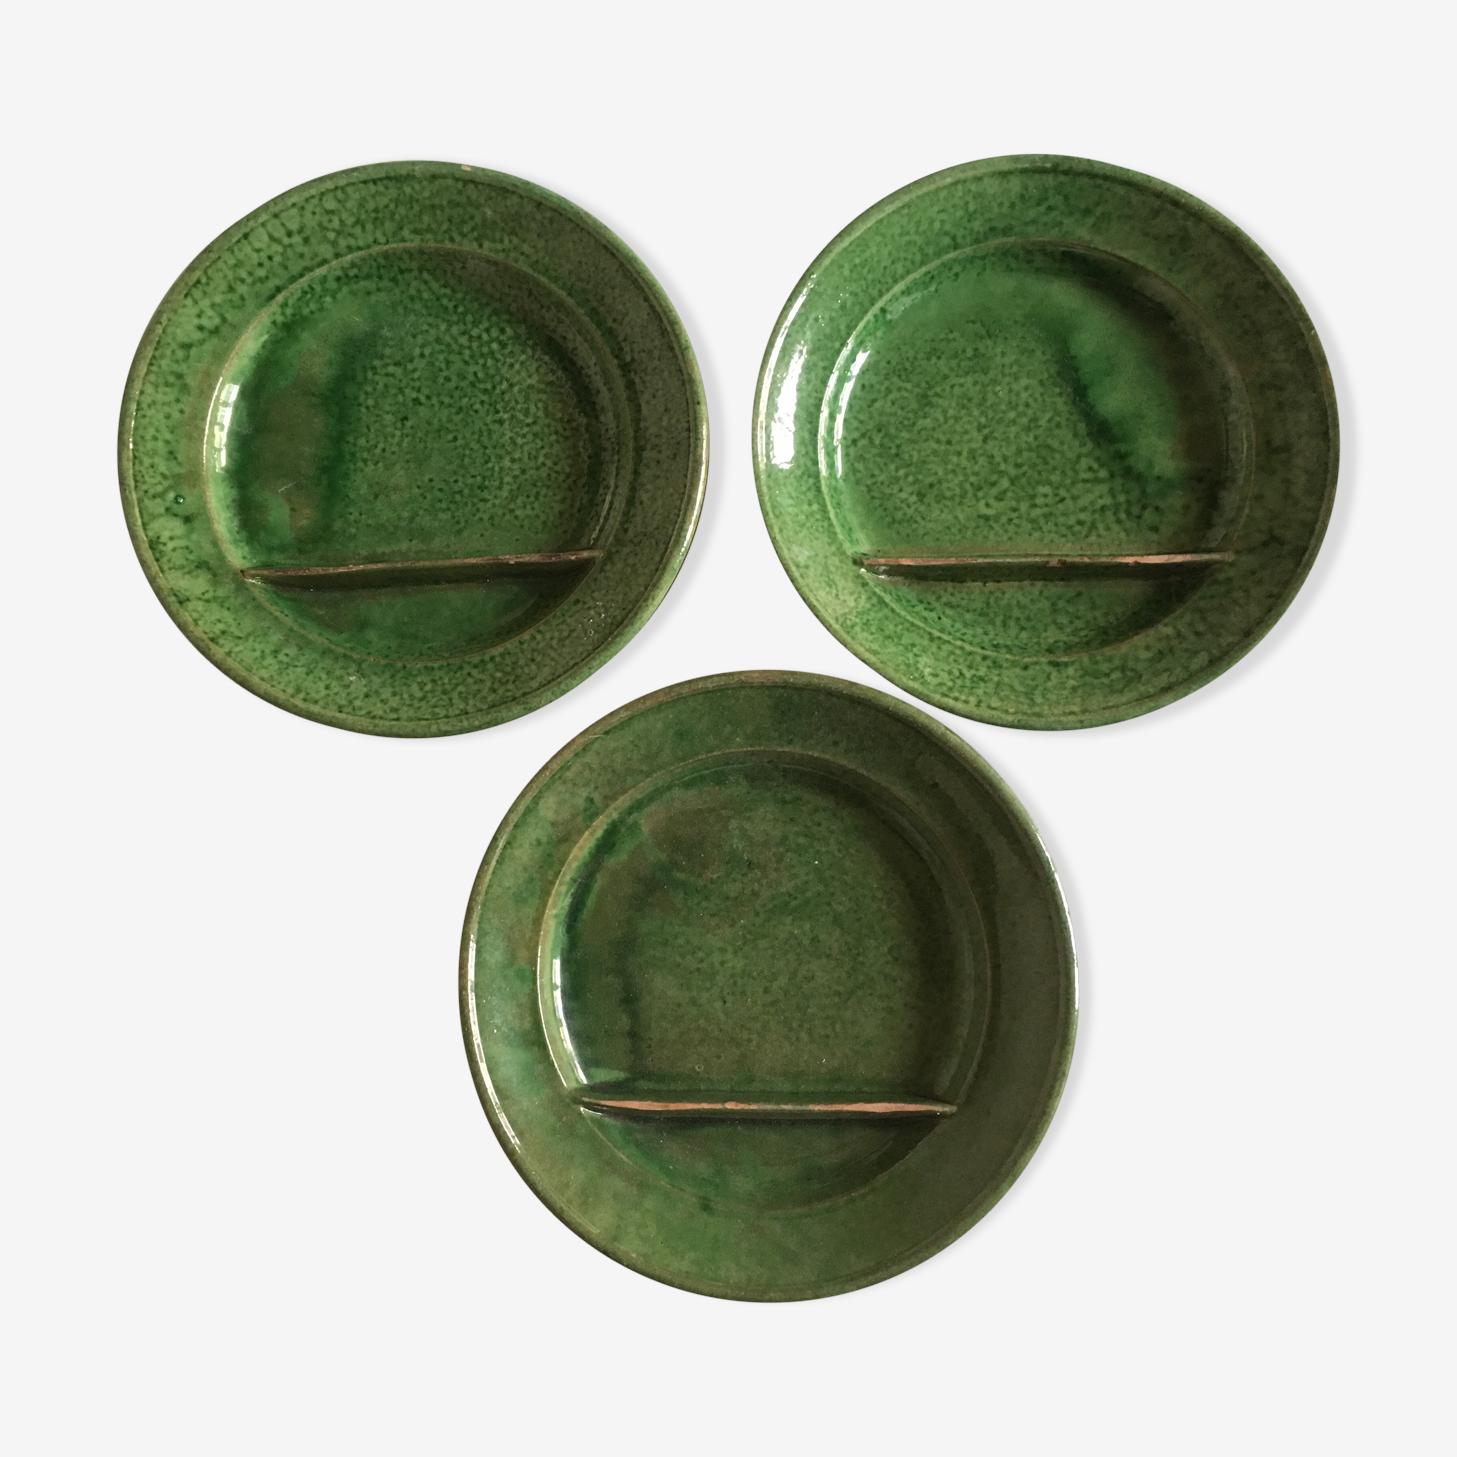 Biot 60s s glazed earthen signed plates